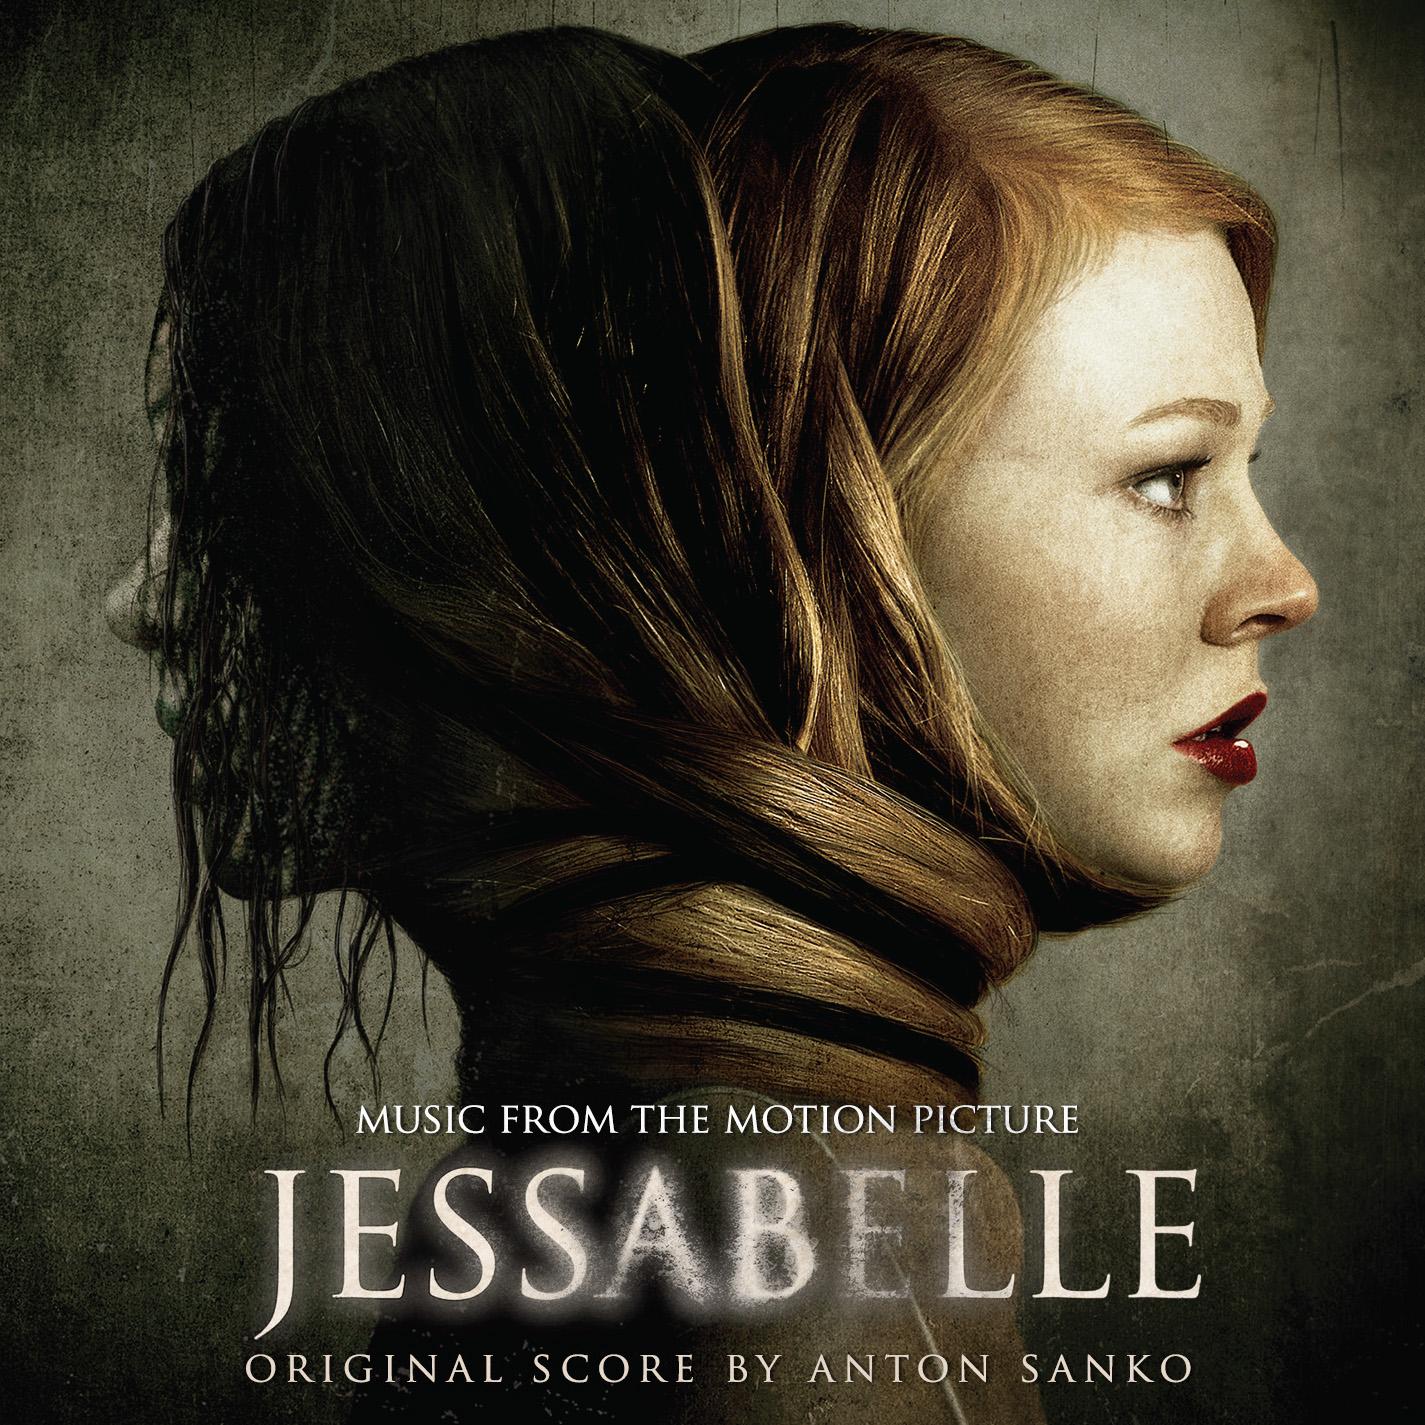 jessabelle-poster-2